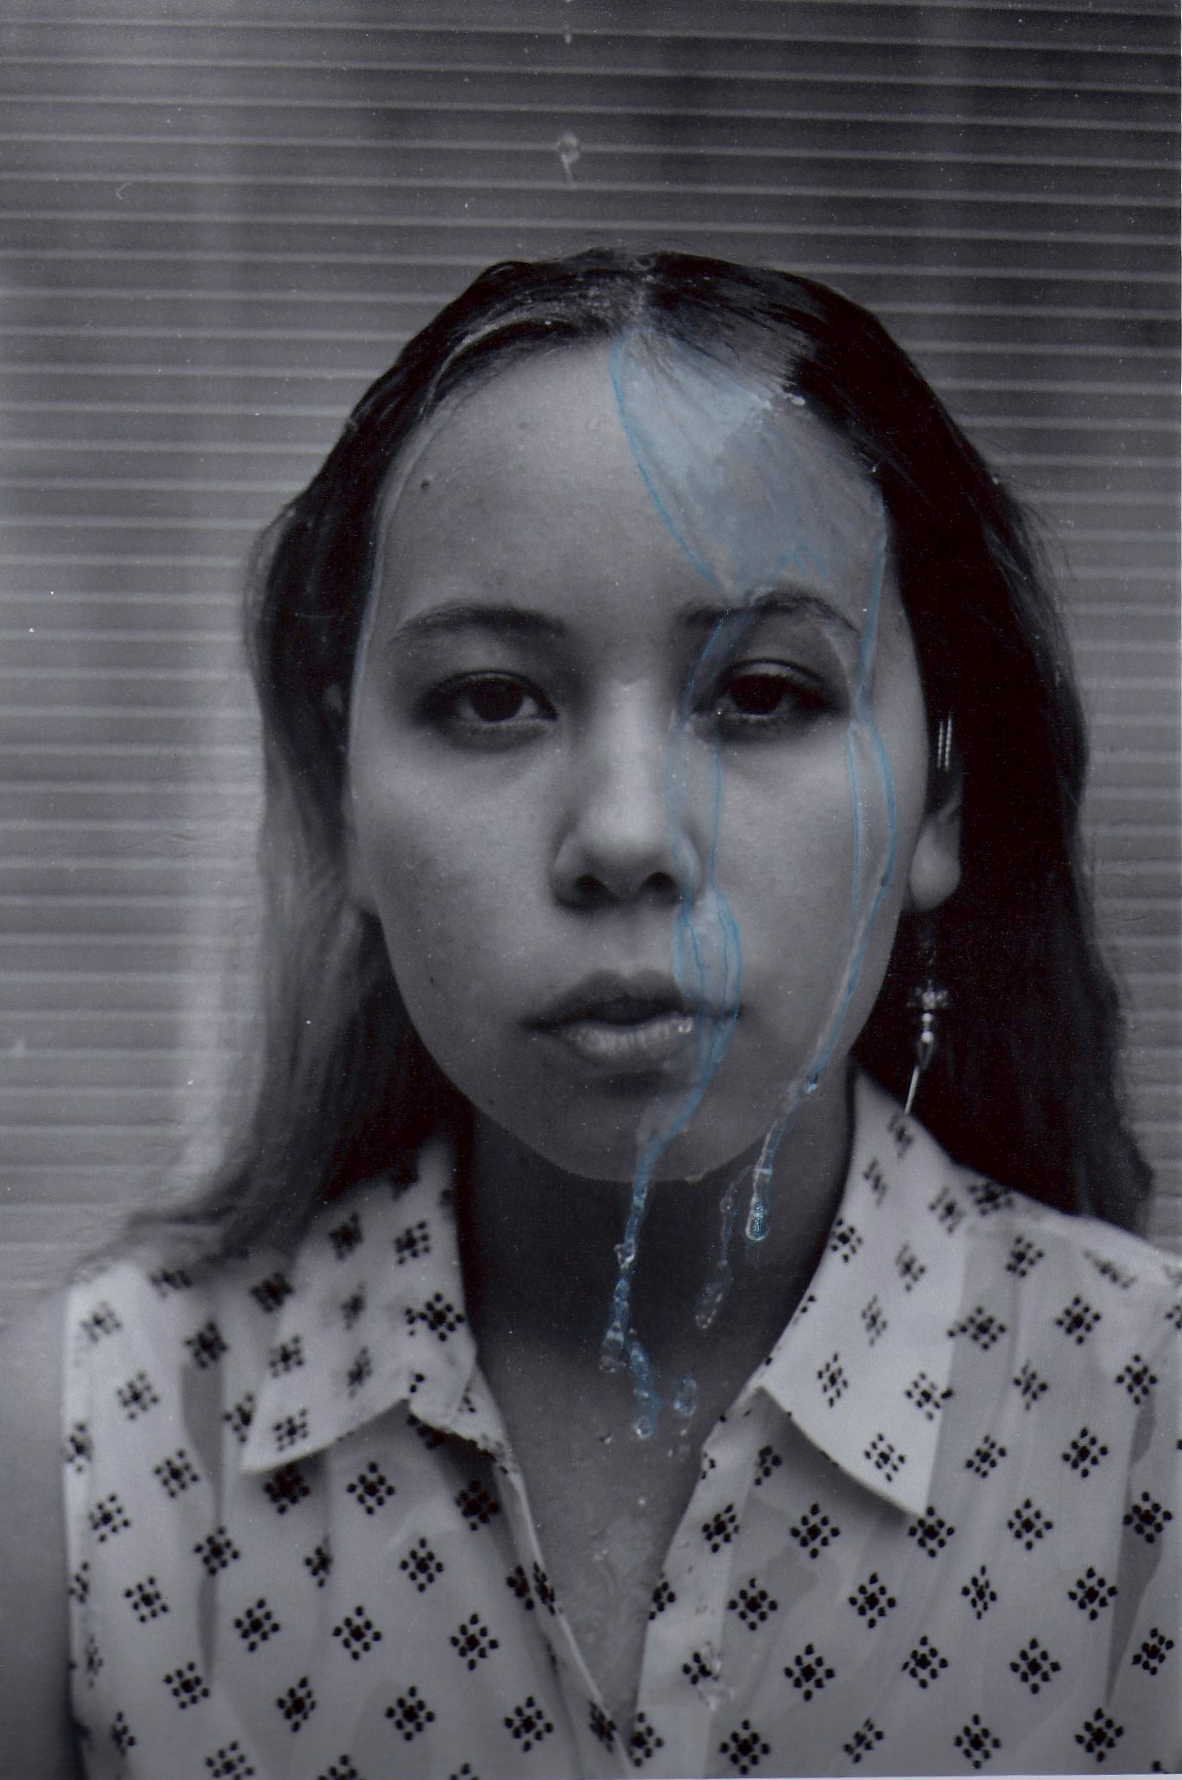 water face film scans.jpg